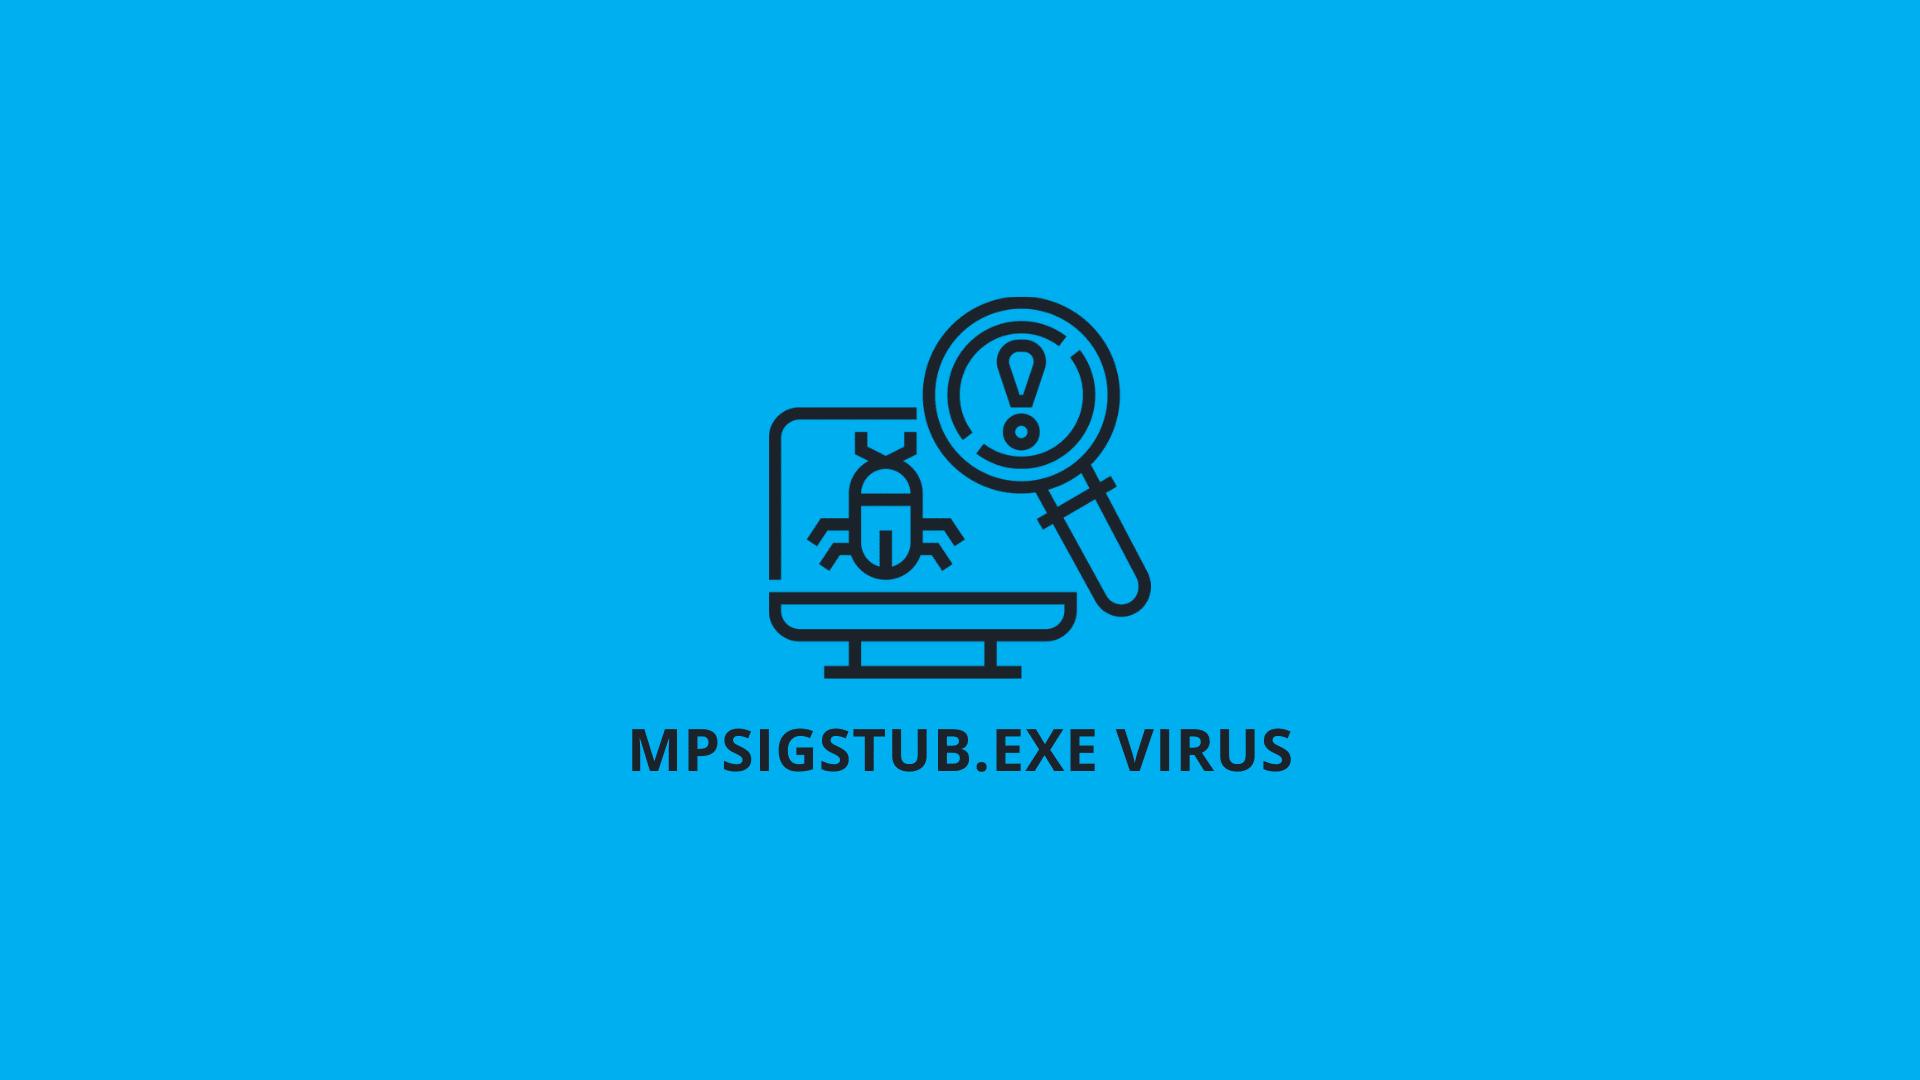 MPSigStub.exe Virus